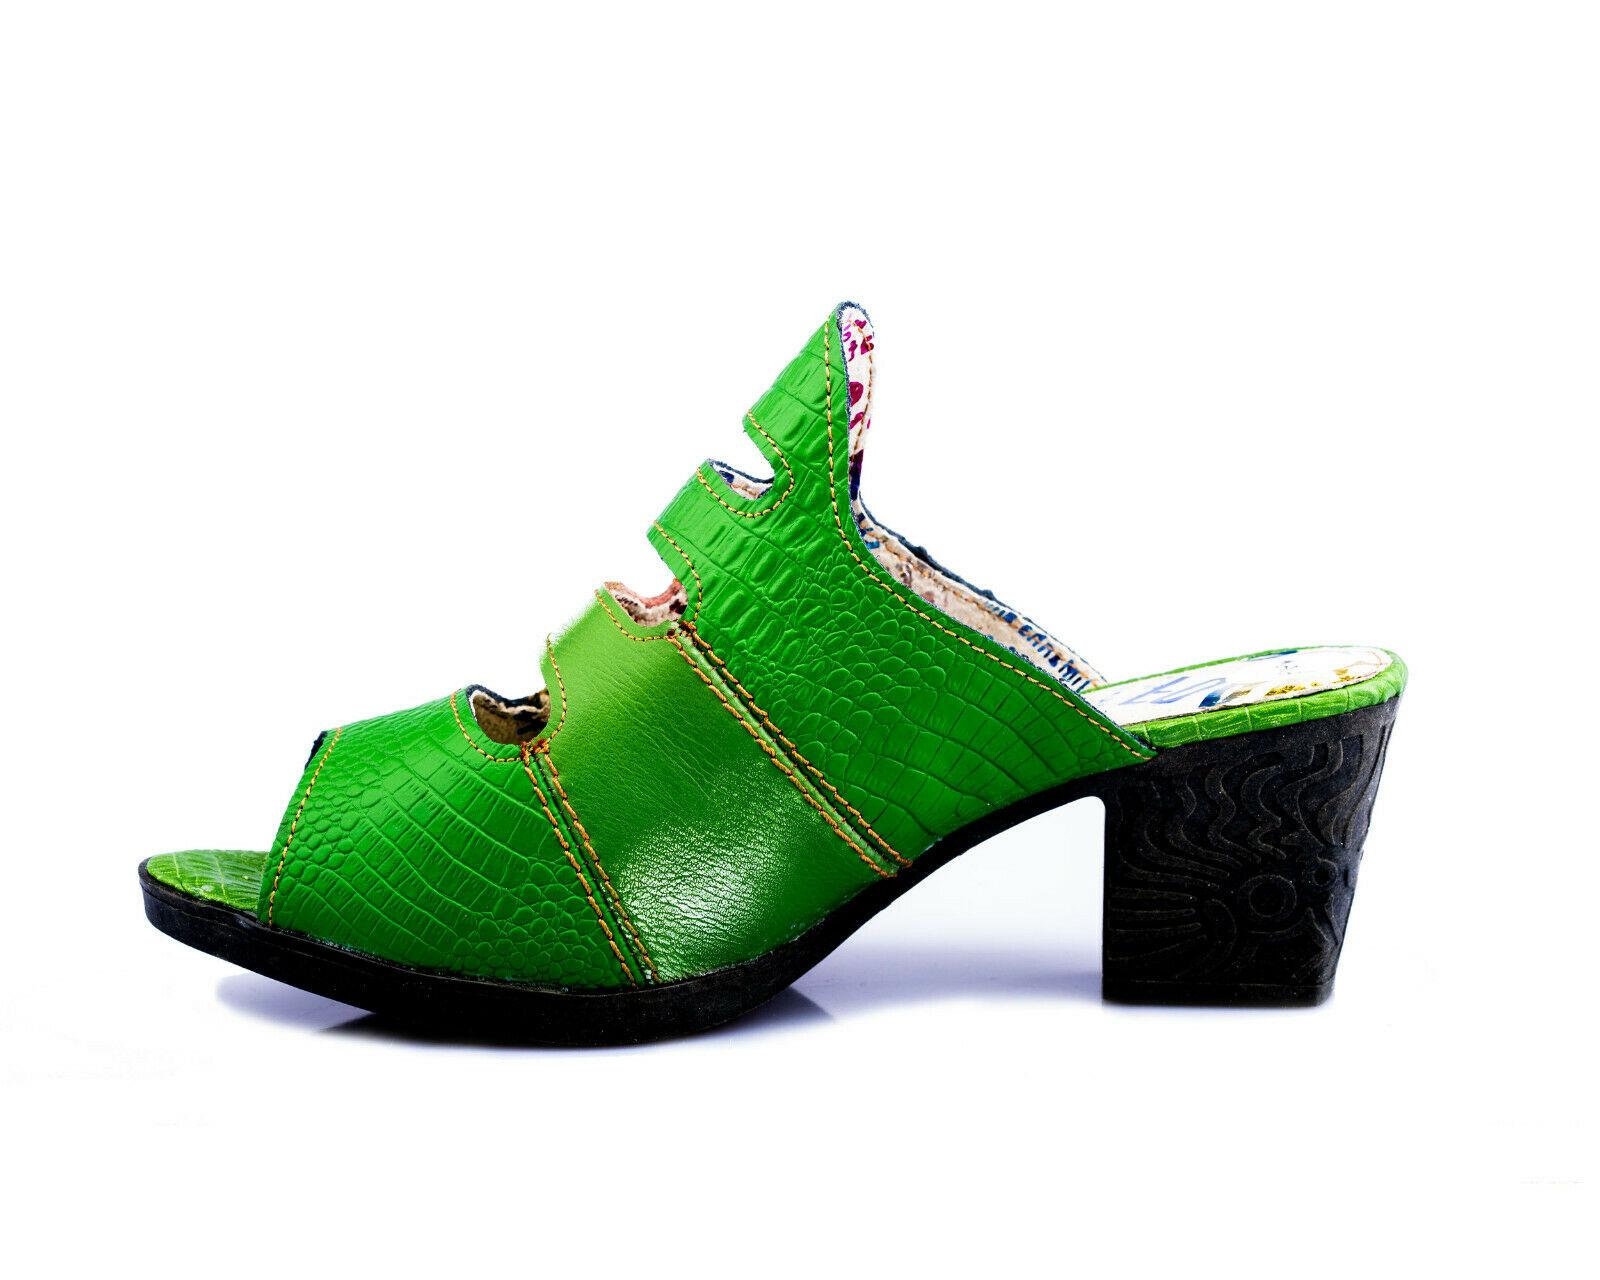 Details zu TMA 1101 Damen Sandaletten Pumps Echt Leder Sommer Schuhe grün alle Gr. 36 42